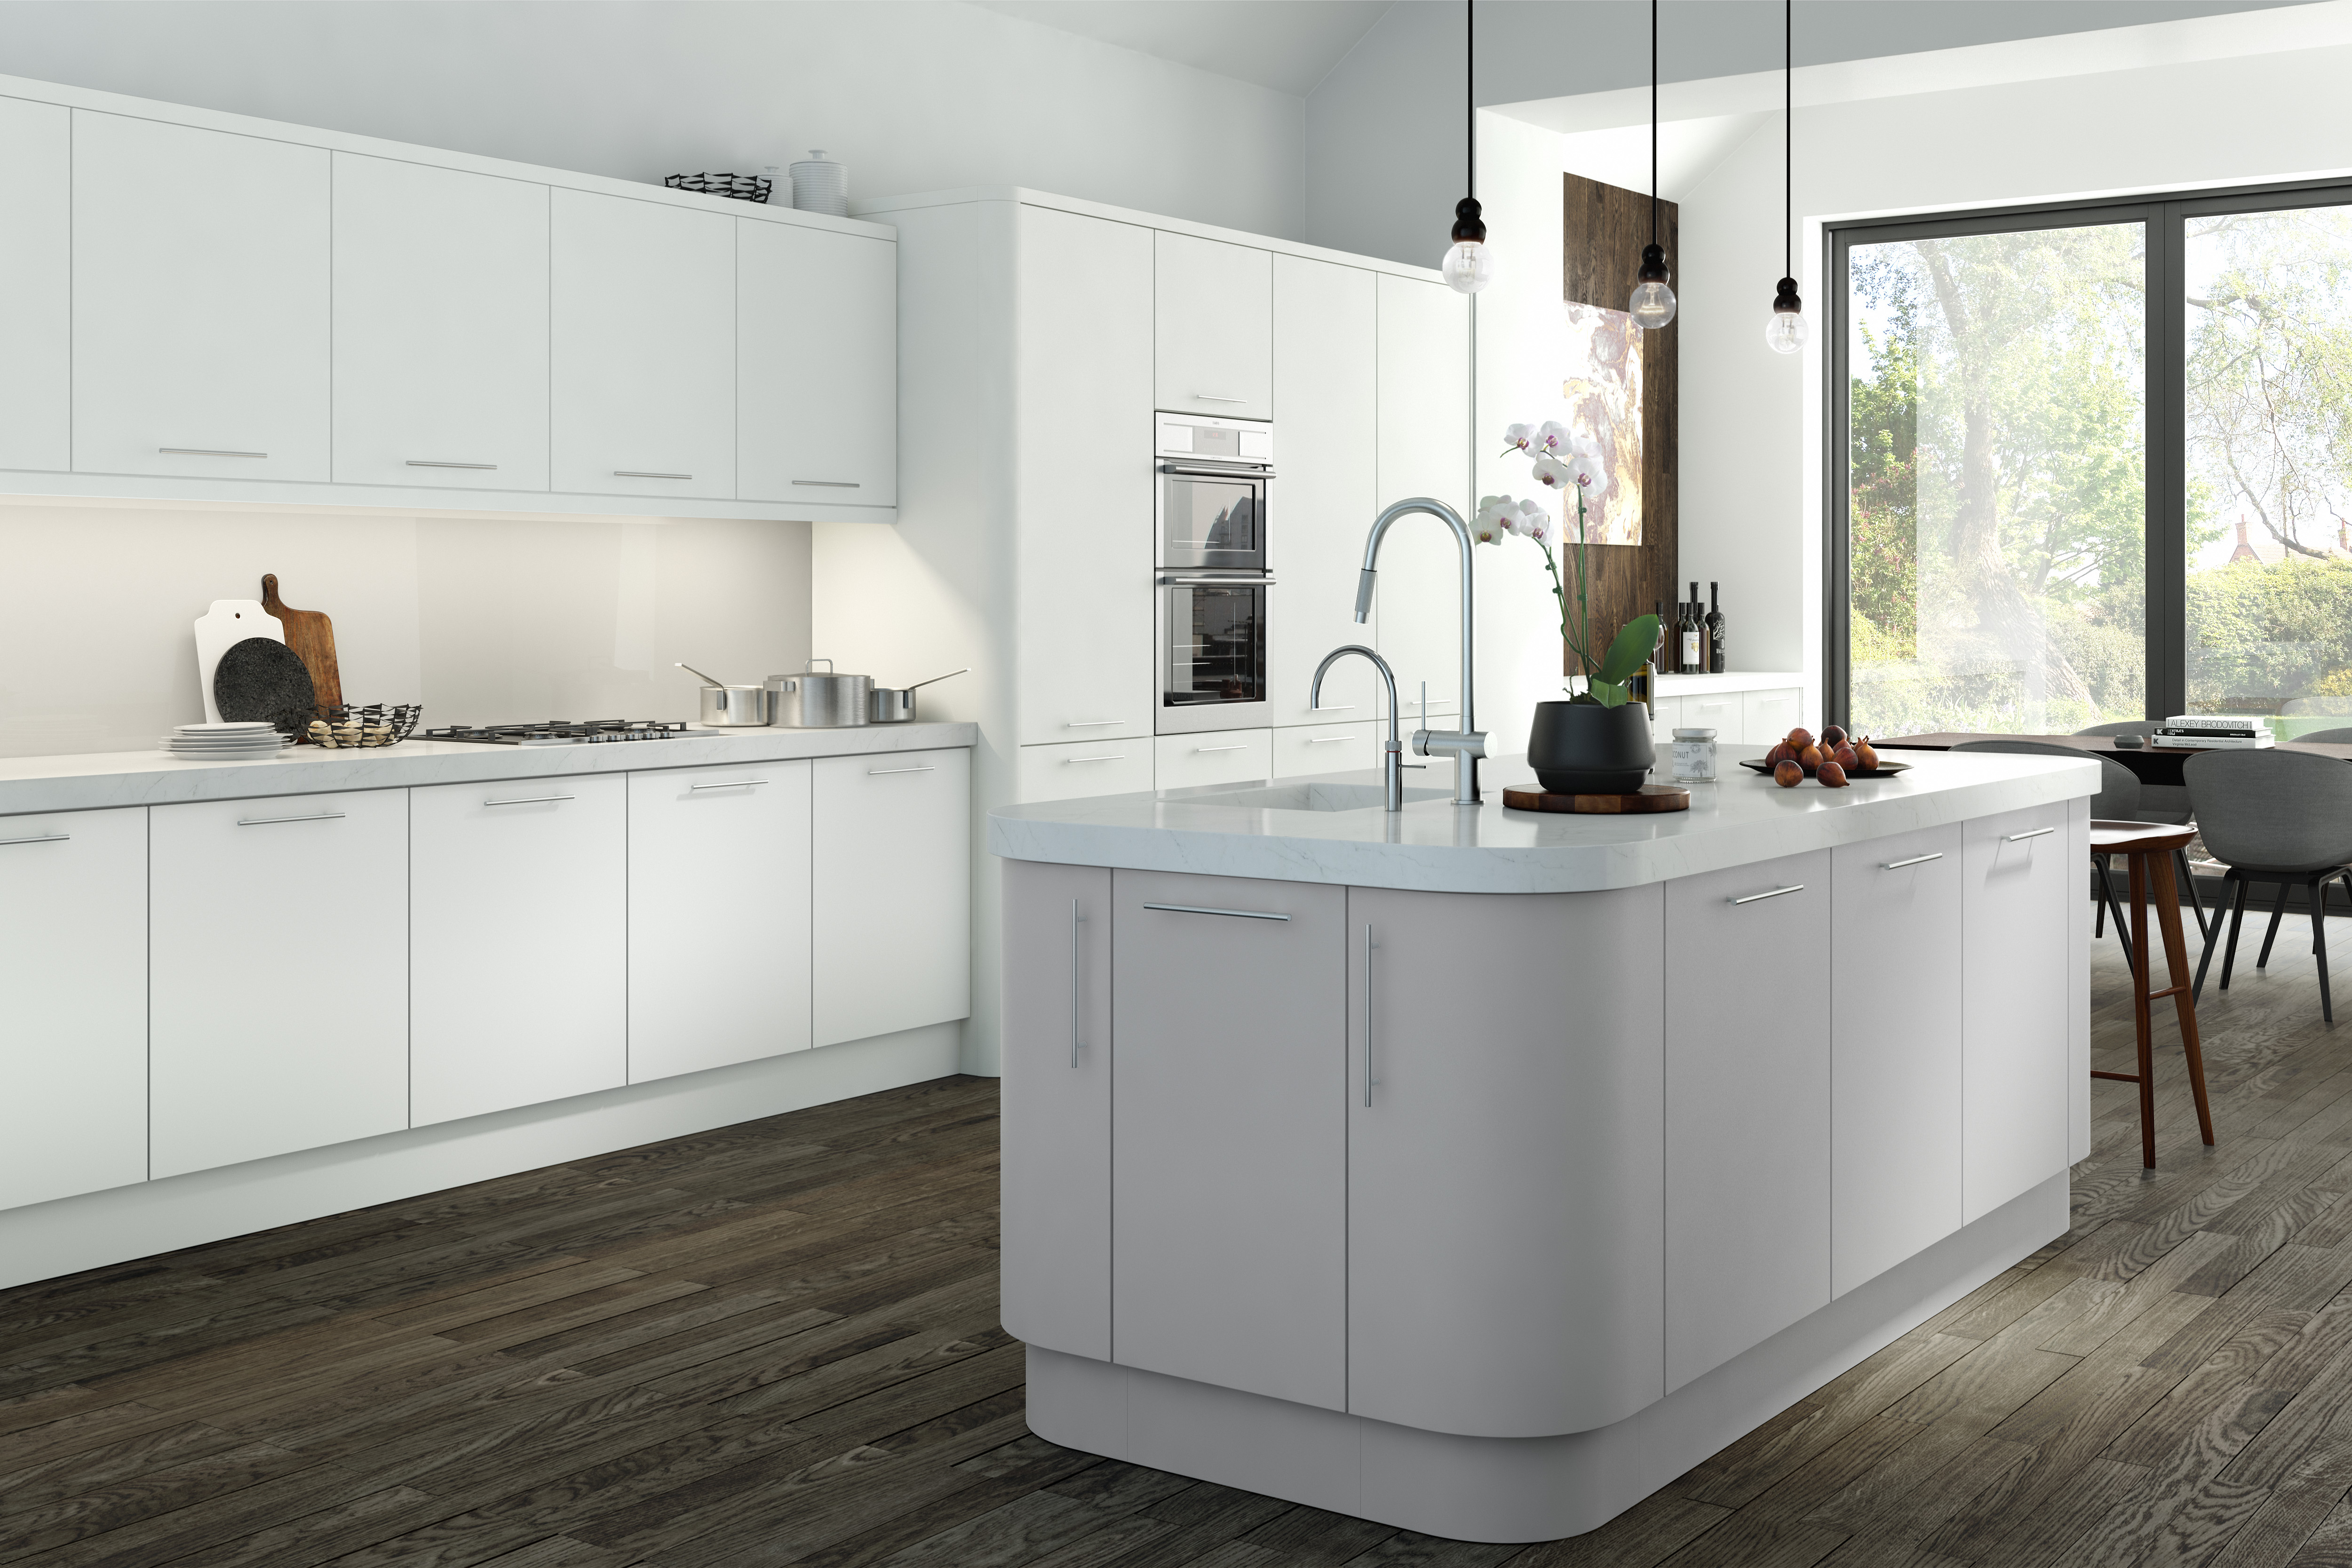 made to measure kitchen cabinet doors kent avh kitchen kitchen cabinet doors made to size kitchen